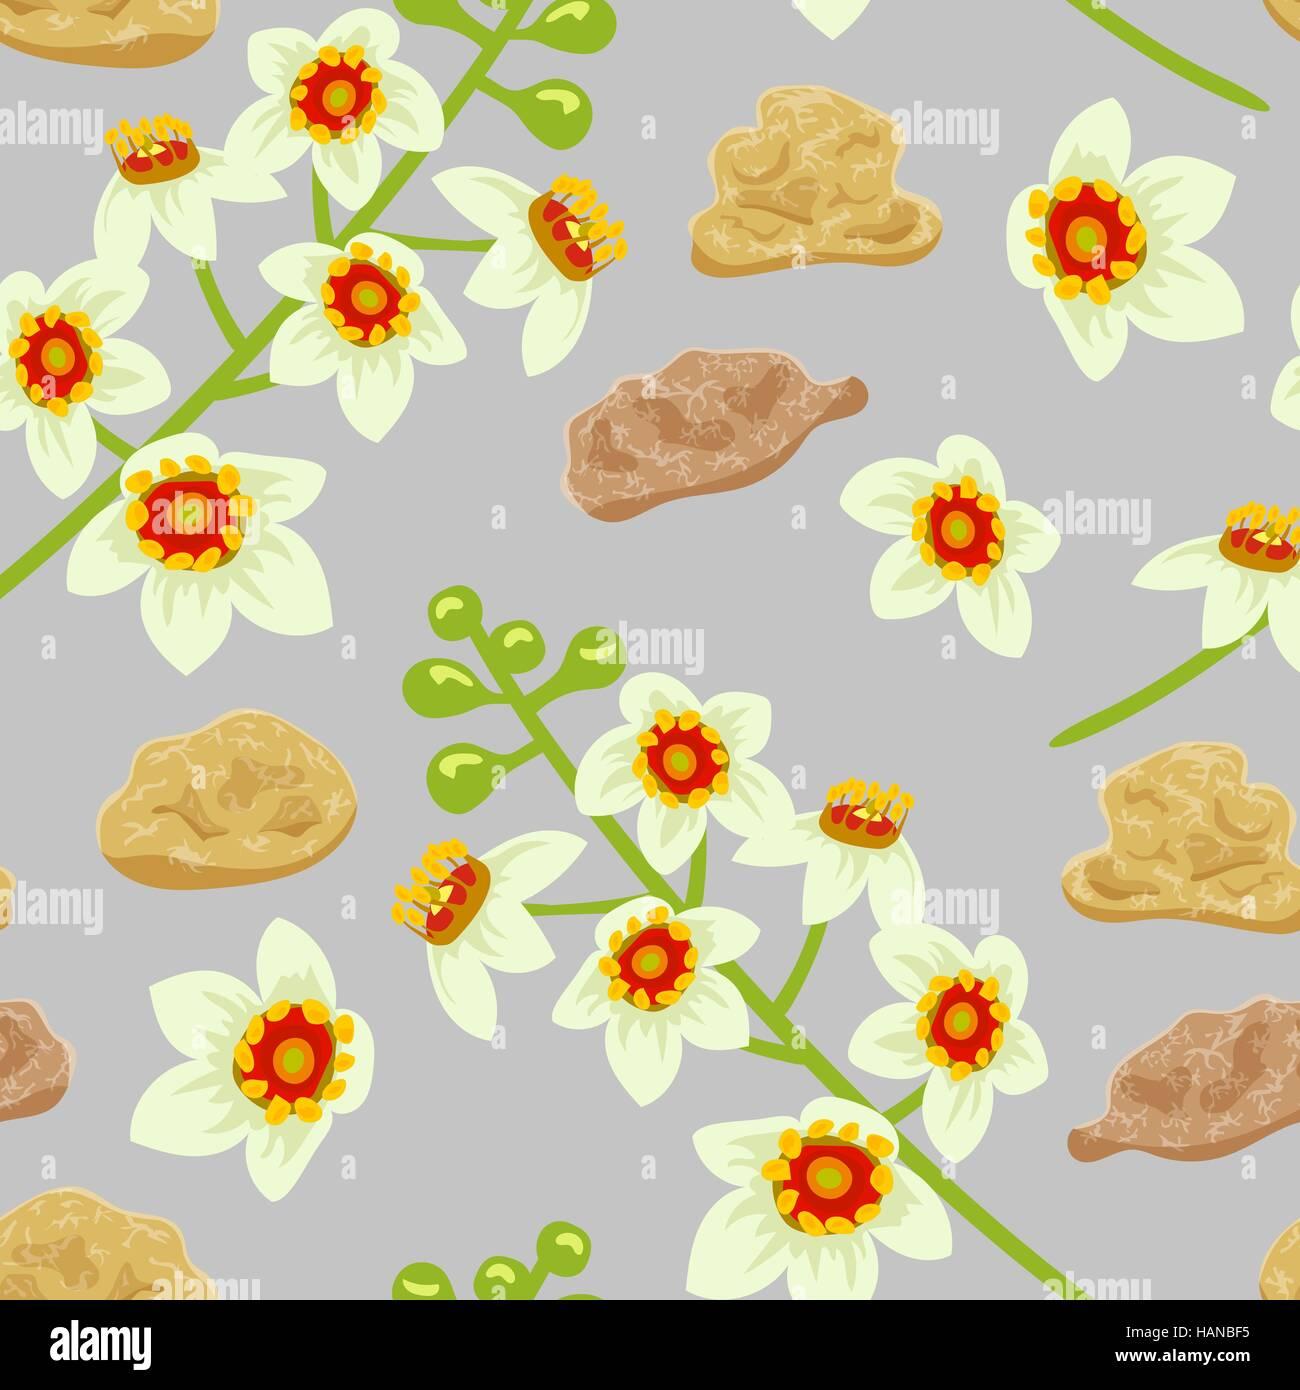 Frankincense seamless pattern. Boswellia tree flowers. - Stock Vector